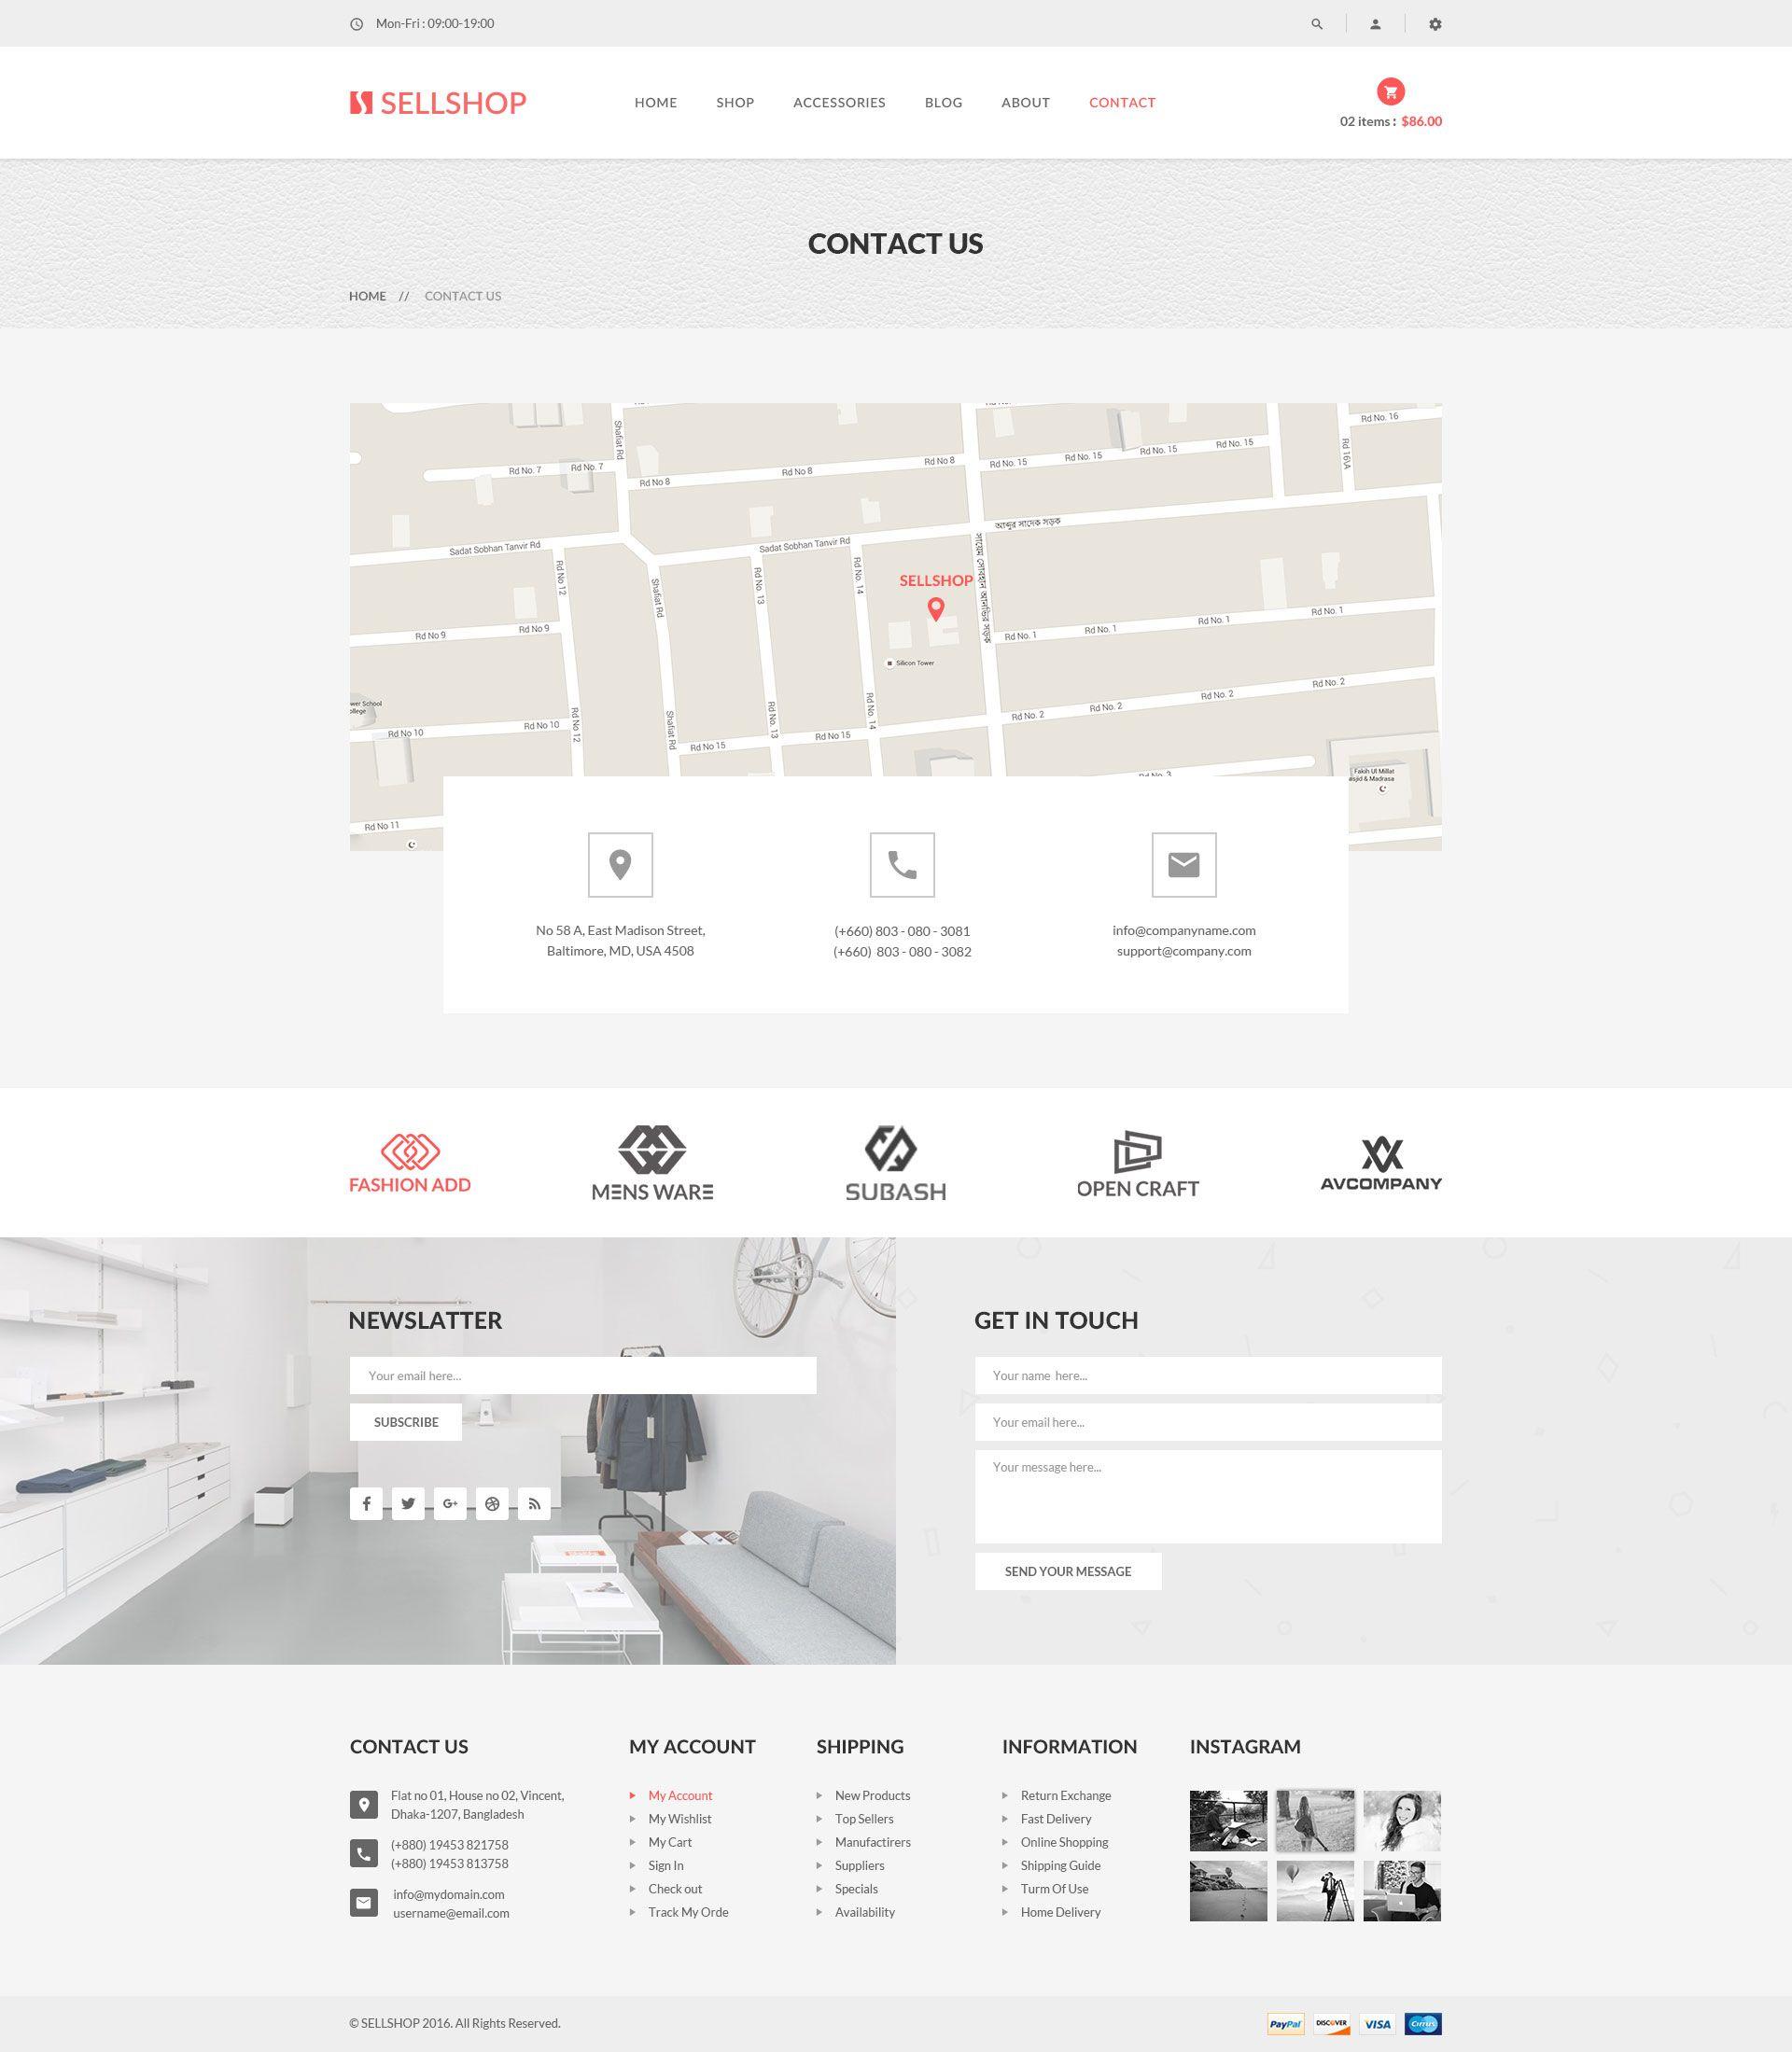 SellShop - eCOMMERCE PSD Template | Fashion | Pinterest